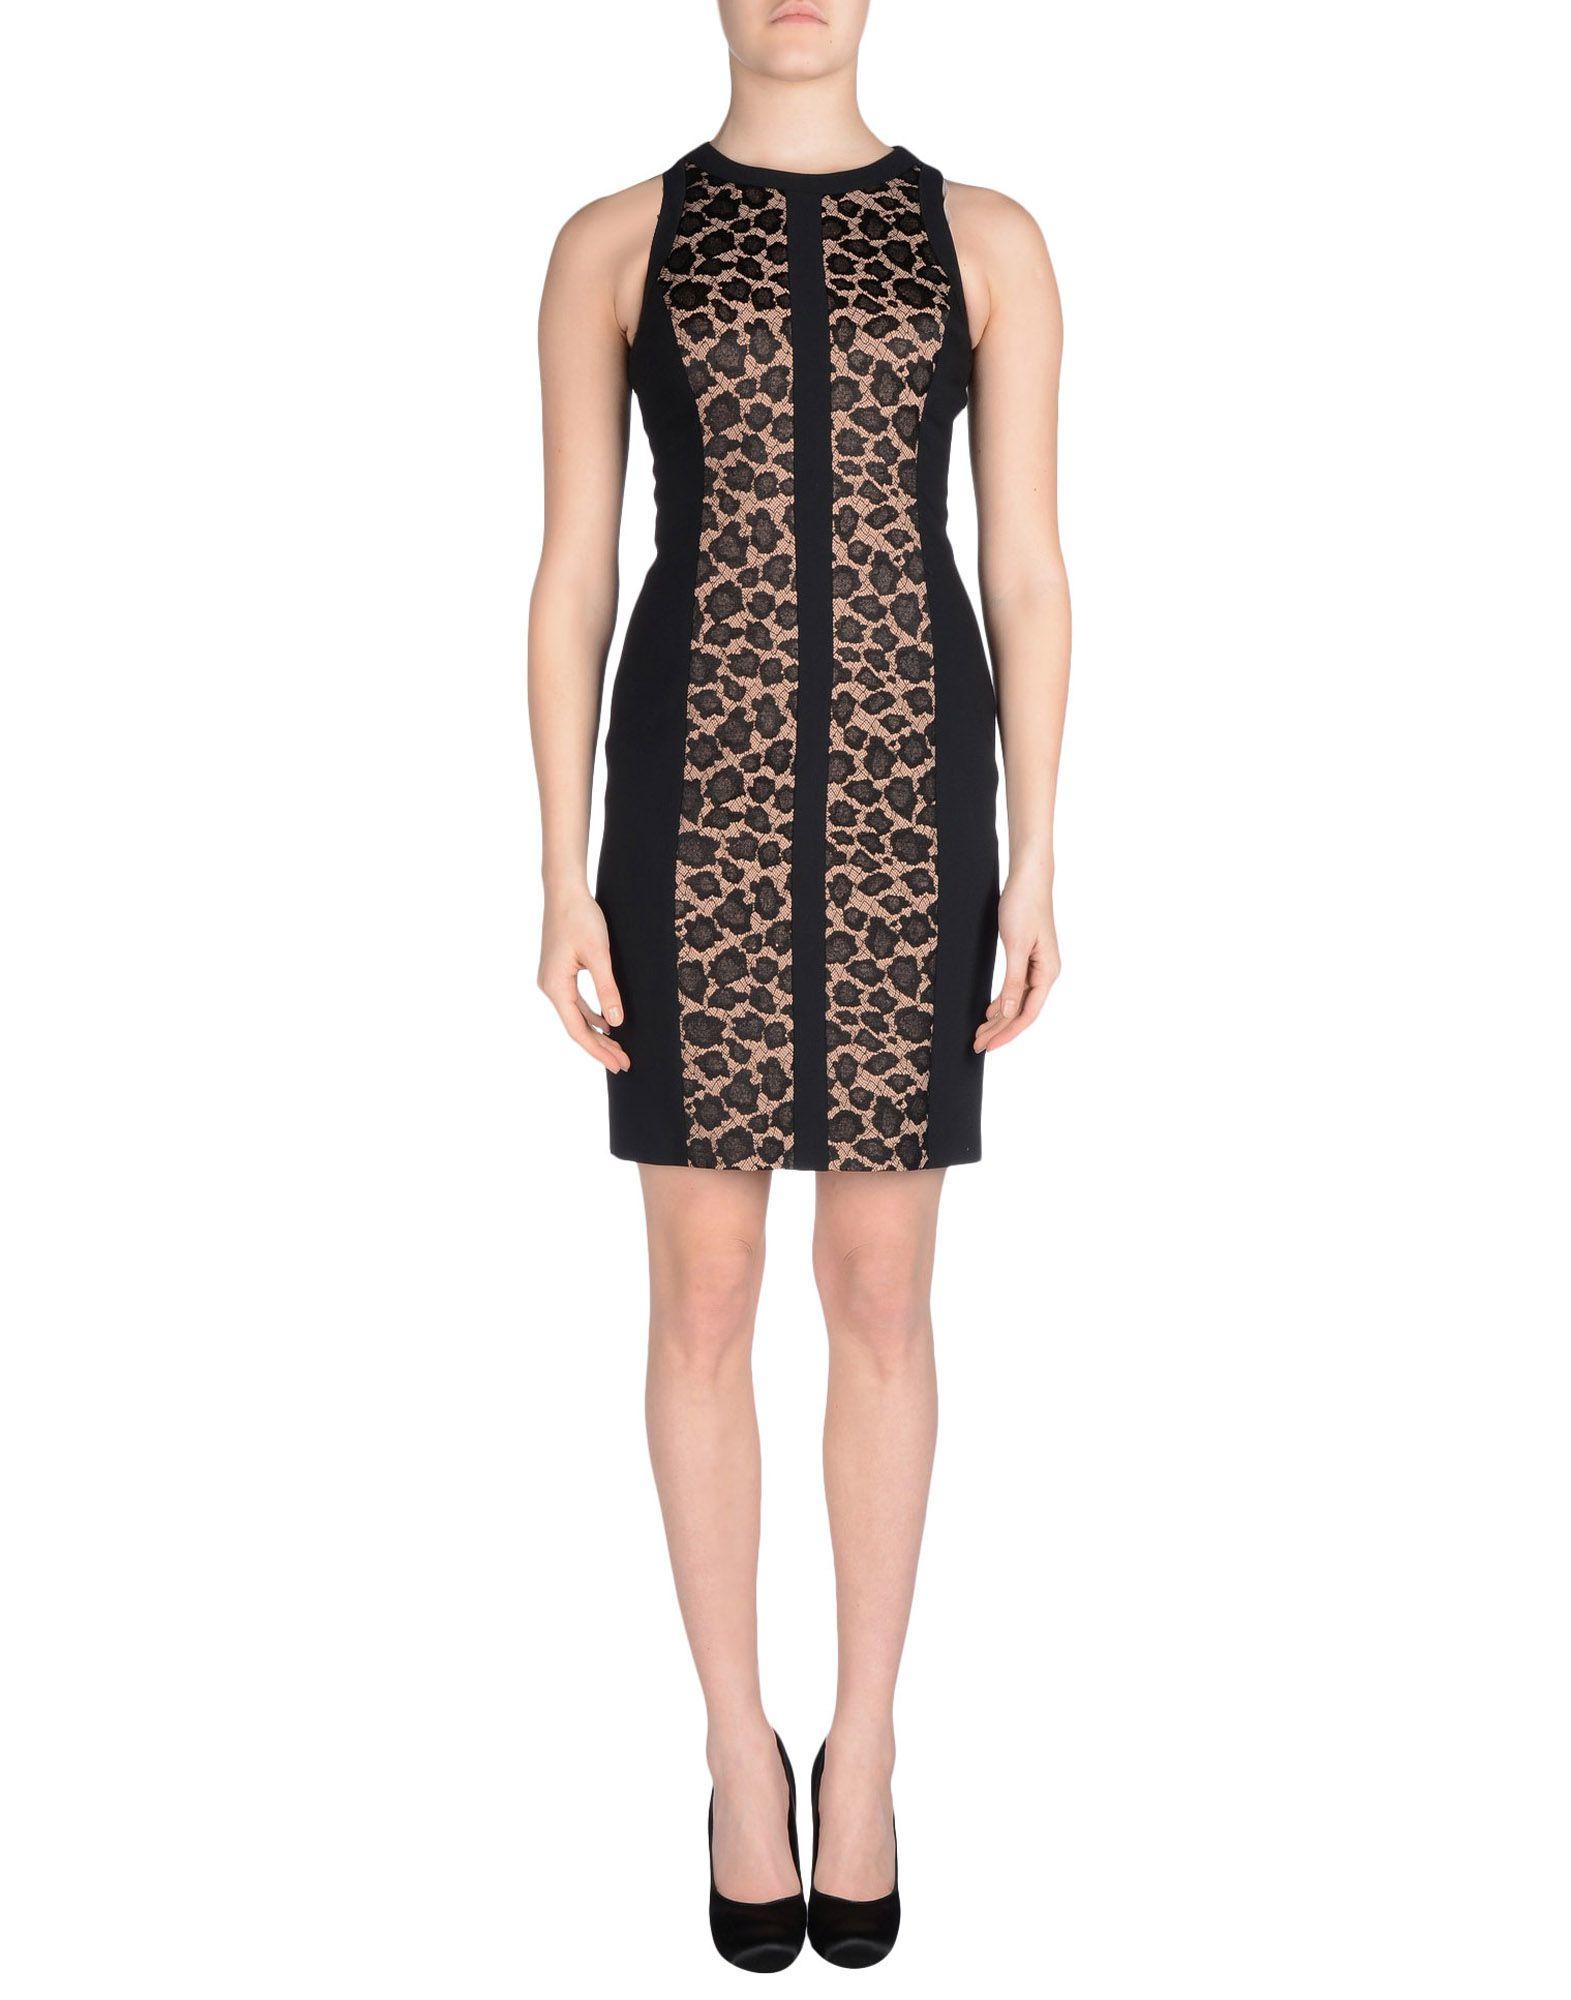 Unique MICHAEL Michael Kors Embellished Neck Sleeveless Dress (Petite) For Women | Fosoz